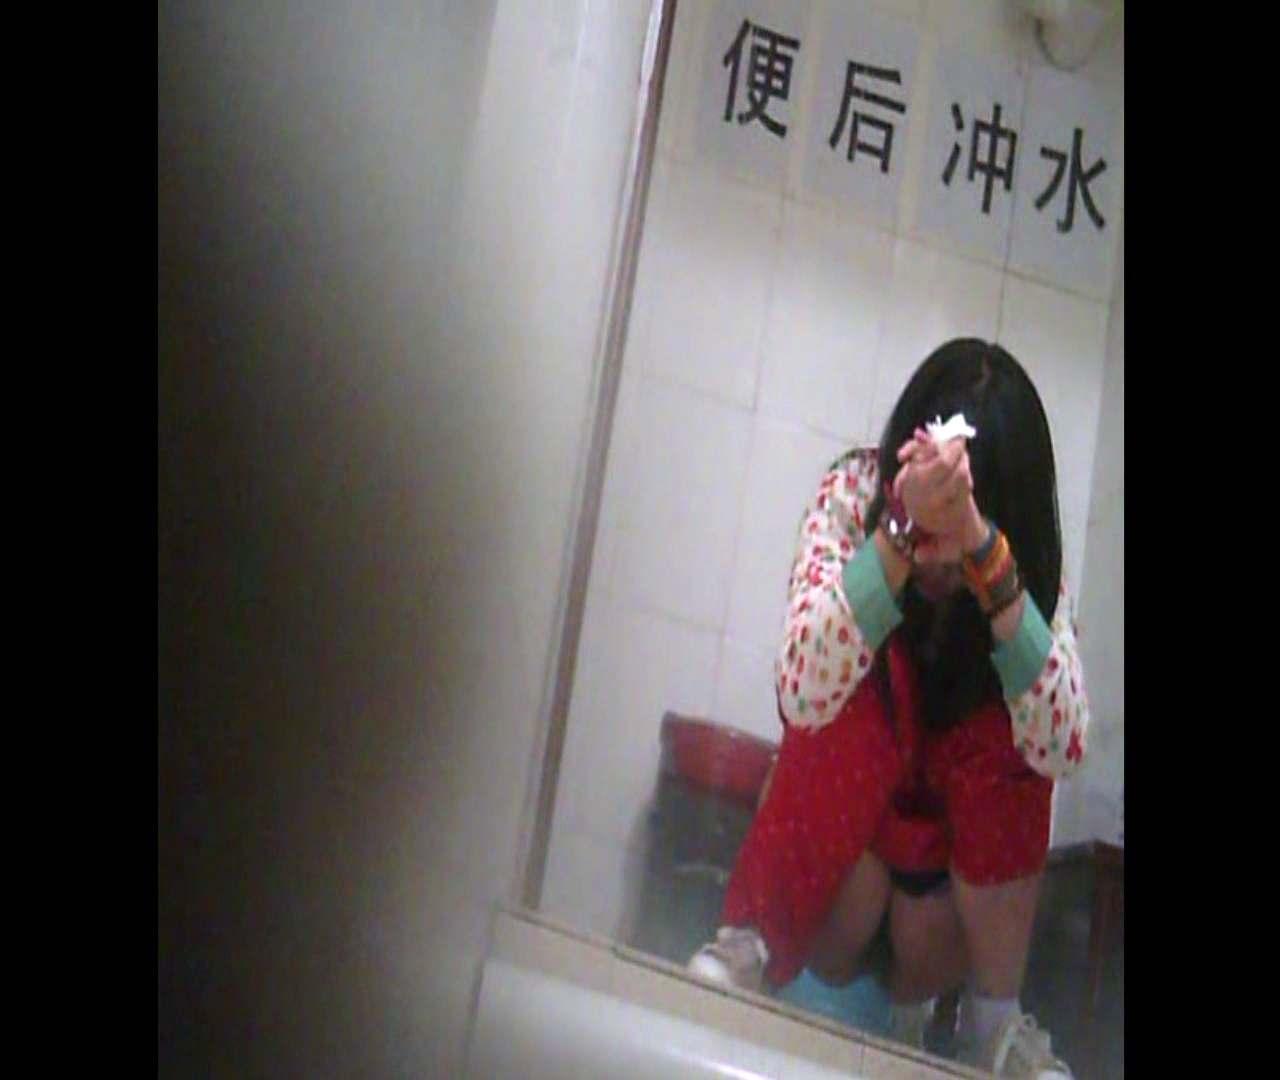 Vol.01 赤のパンツスタイルがとっても眩しい!! 洗面所 | 丸見え  61画像 49